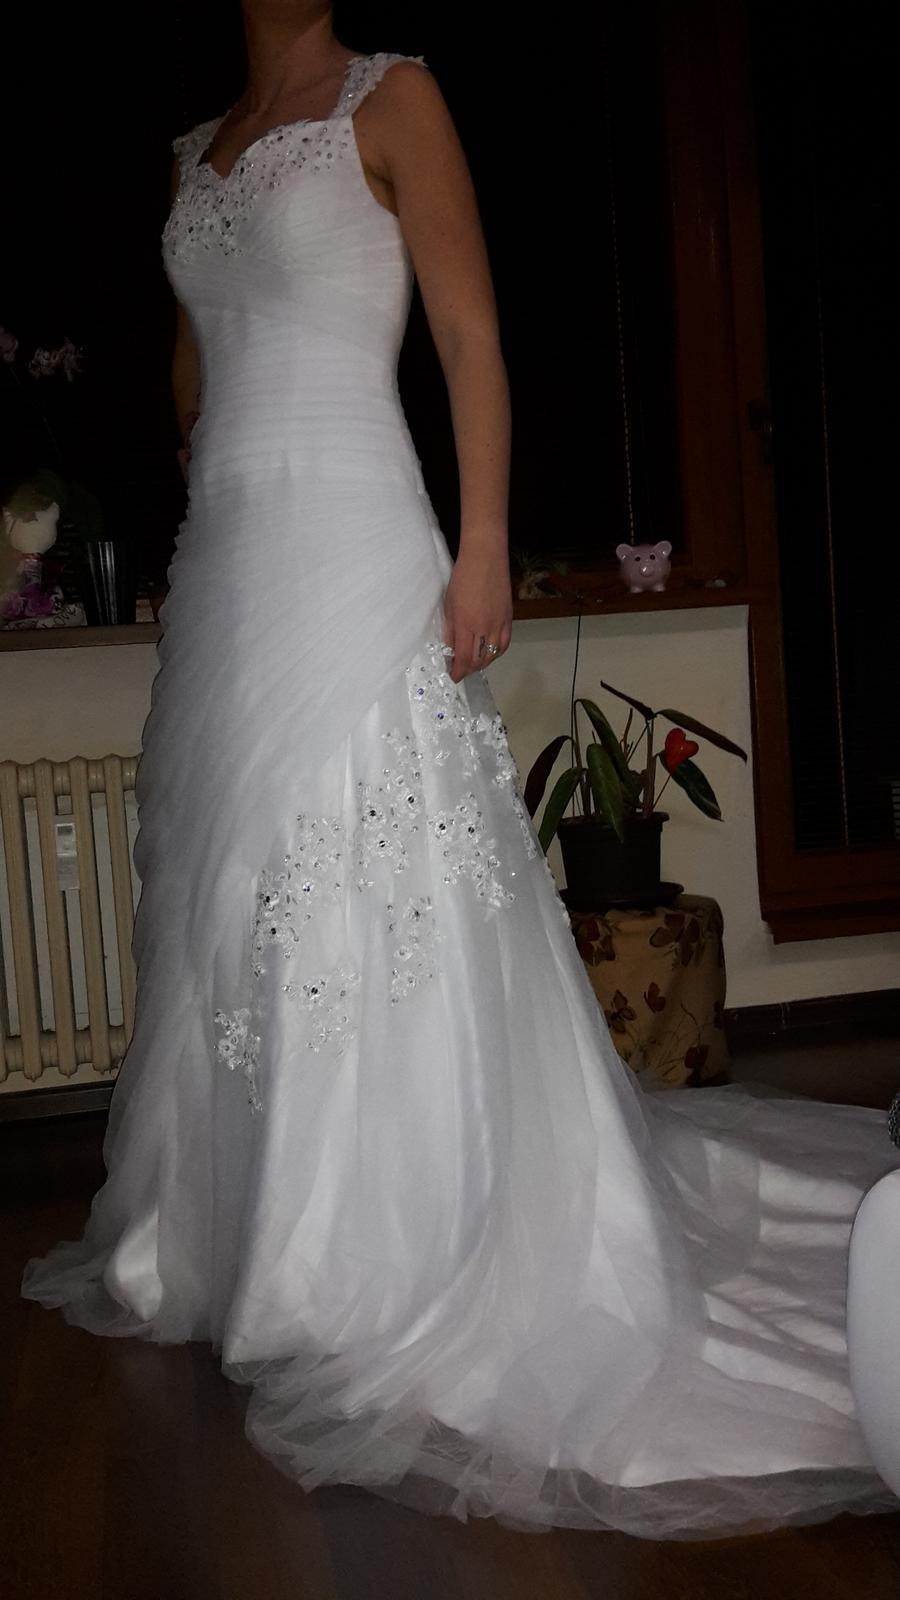 Svadobné šaty (nové) - Obrázok č. 2